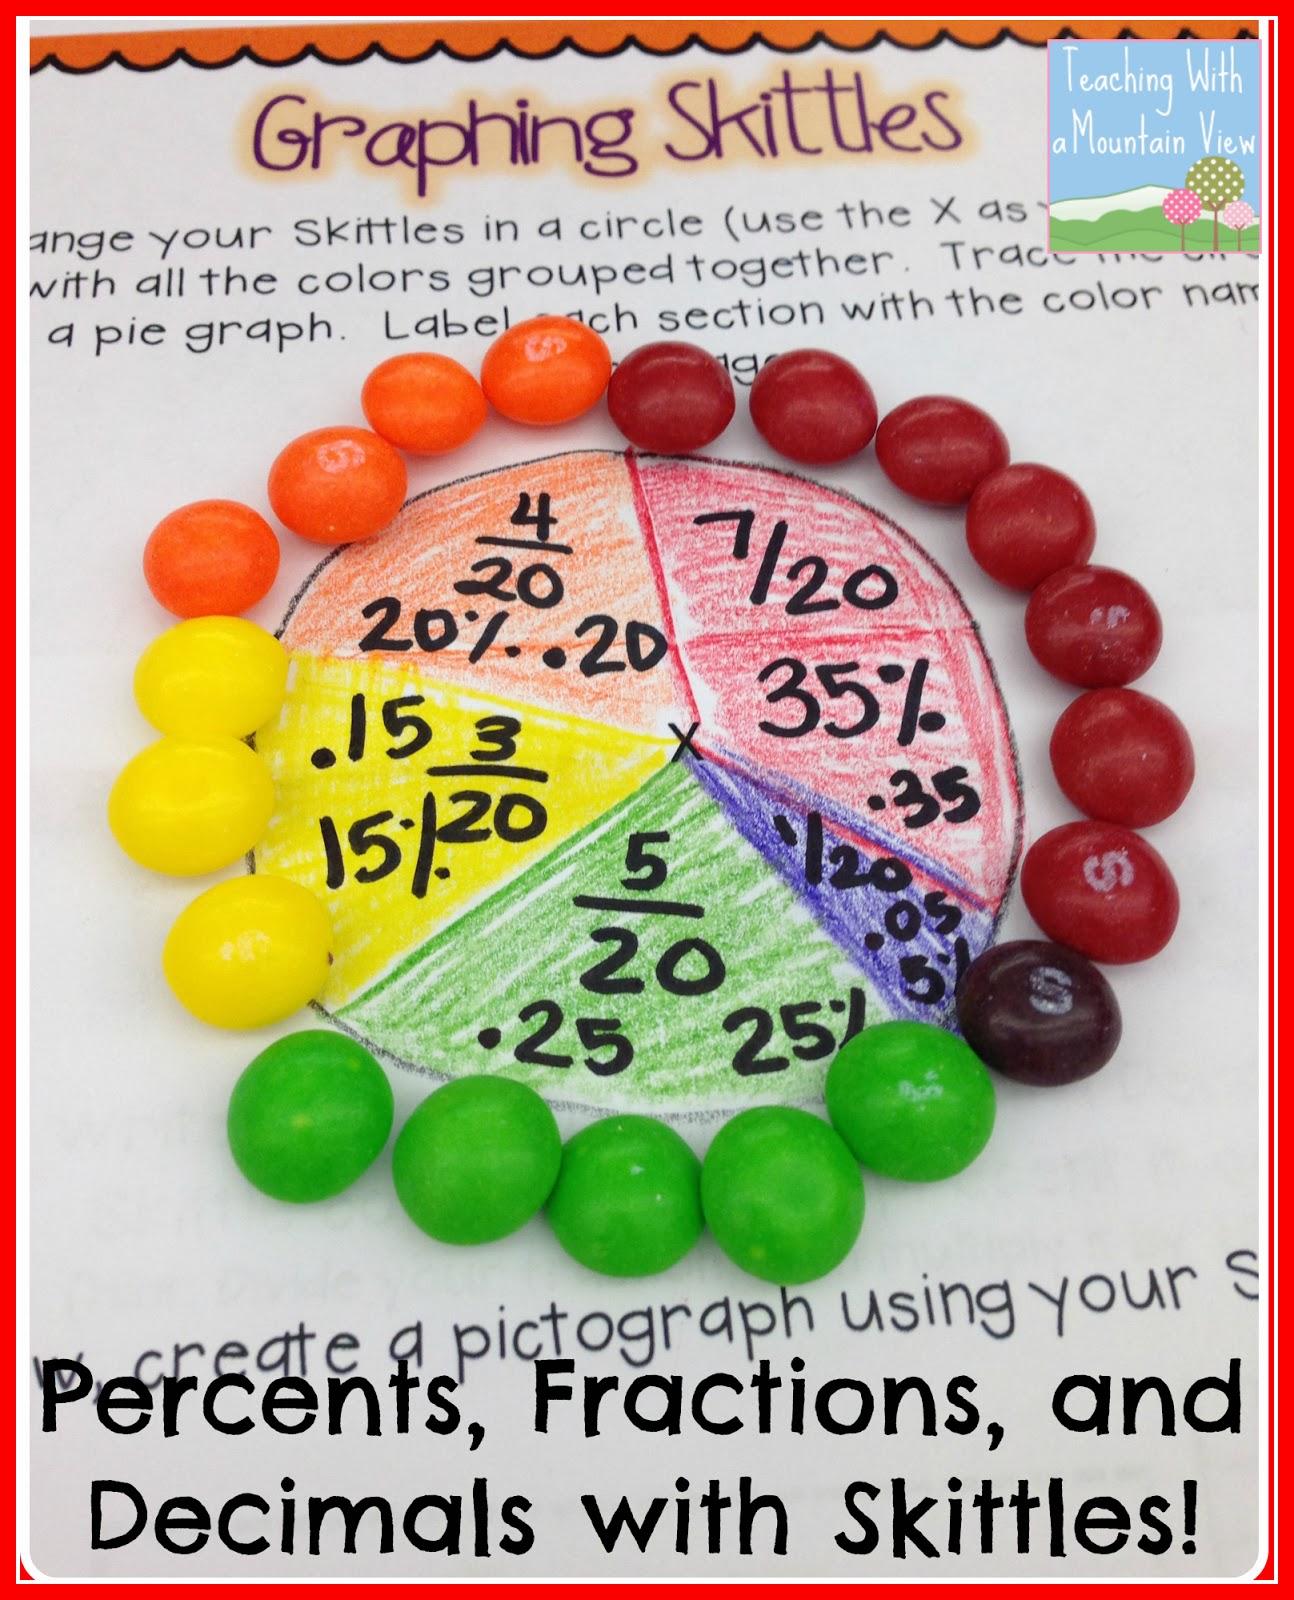 Skittle fractions template new calendar template site